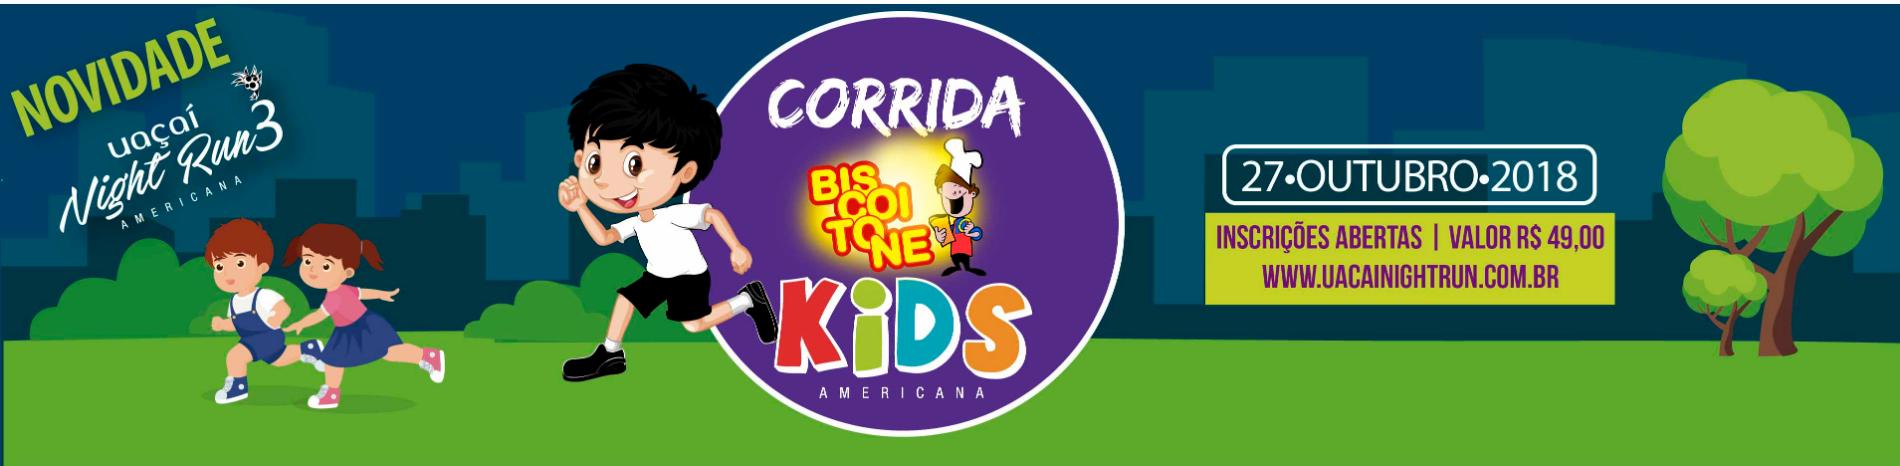 CORRIDA UAÇAÍ KIDS